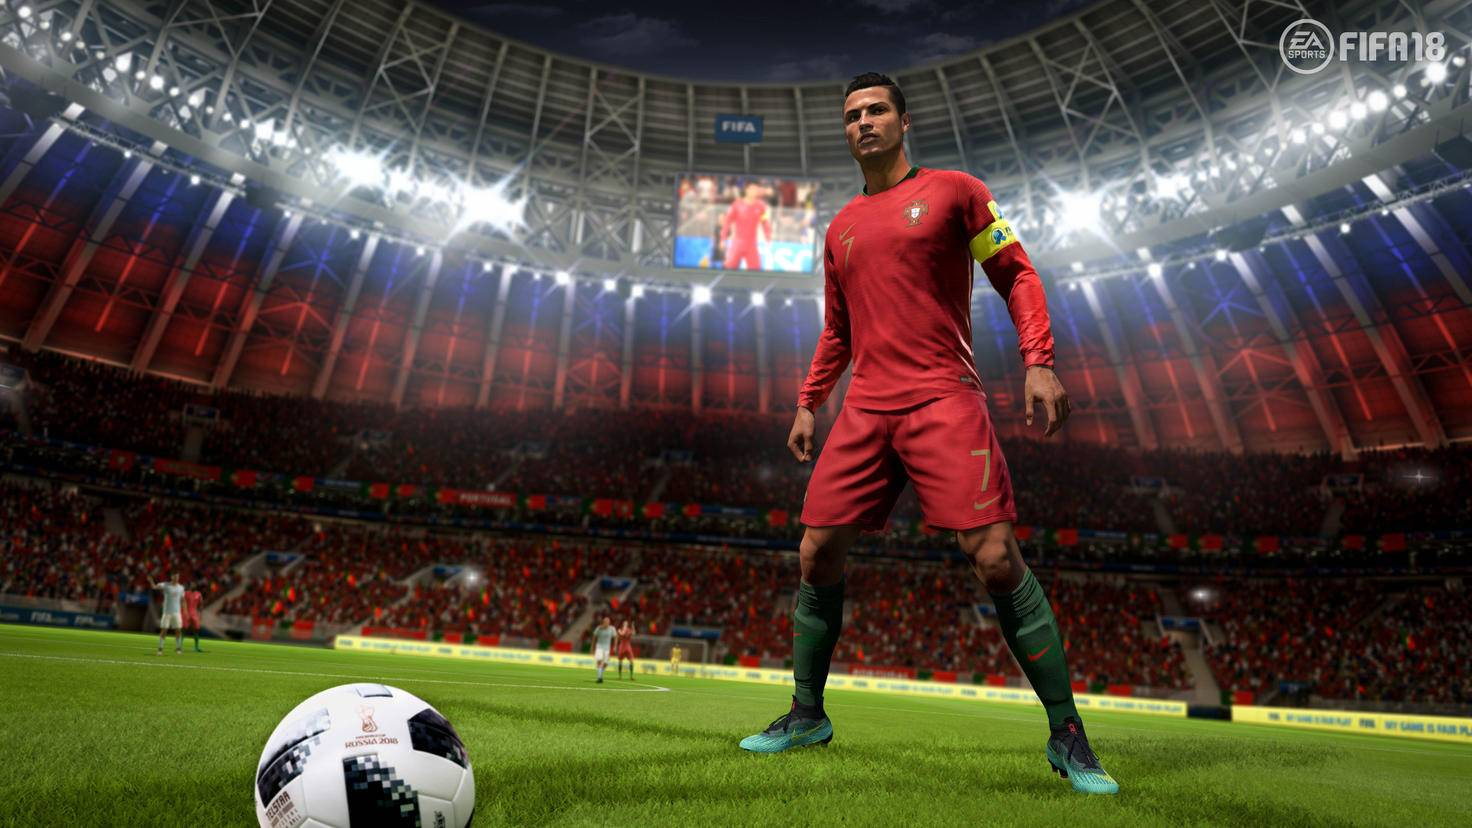 fifa-18-wm-update